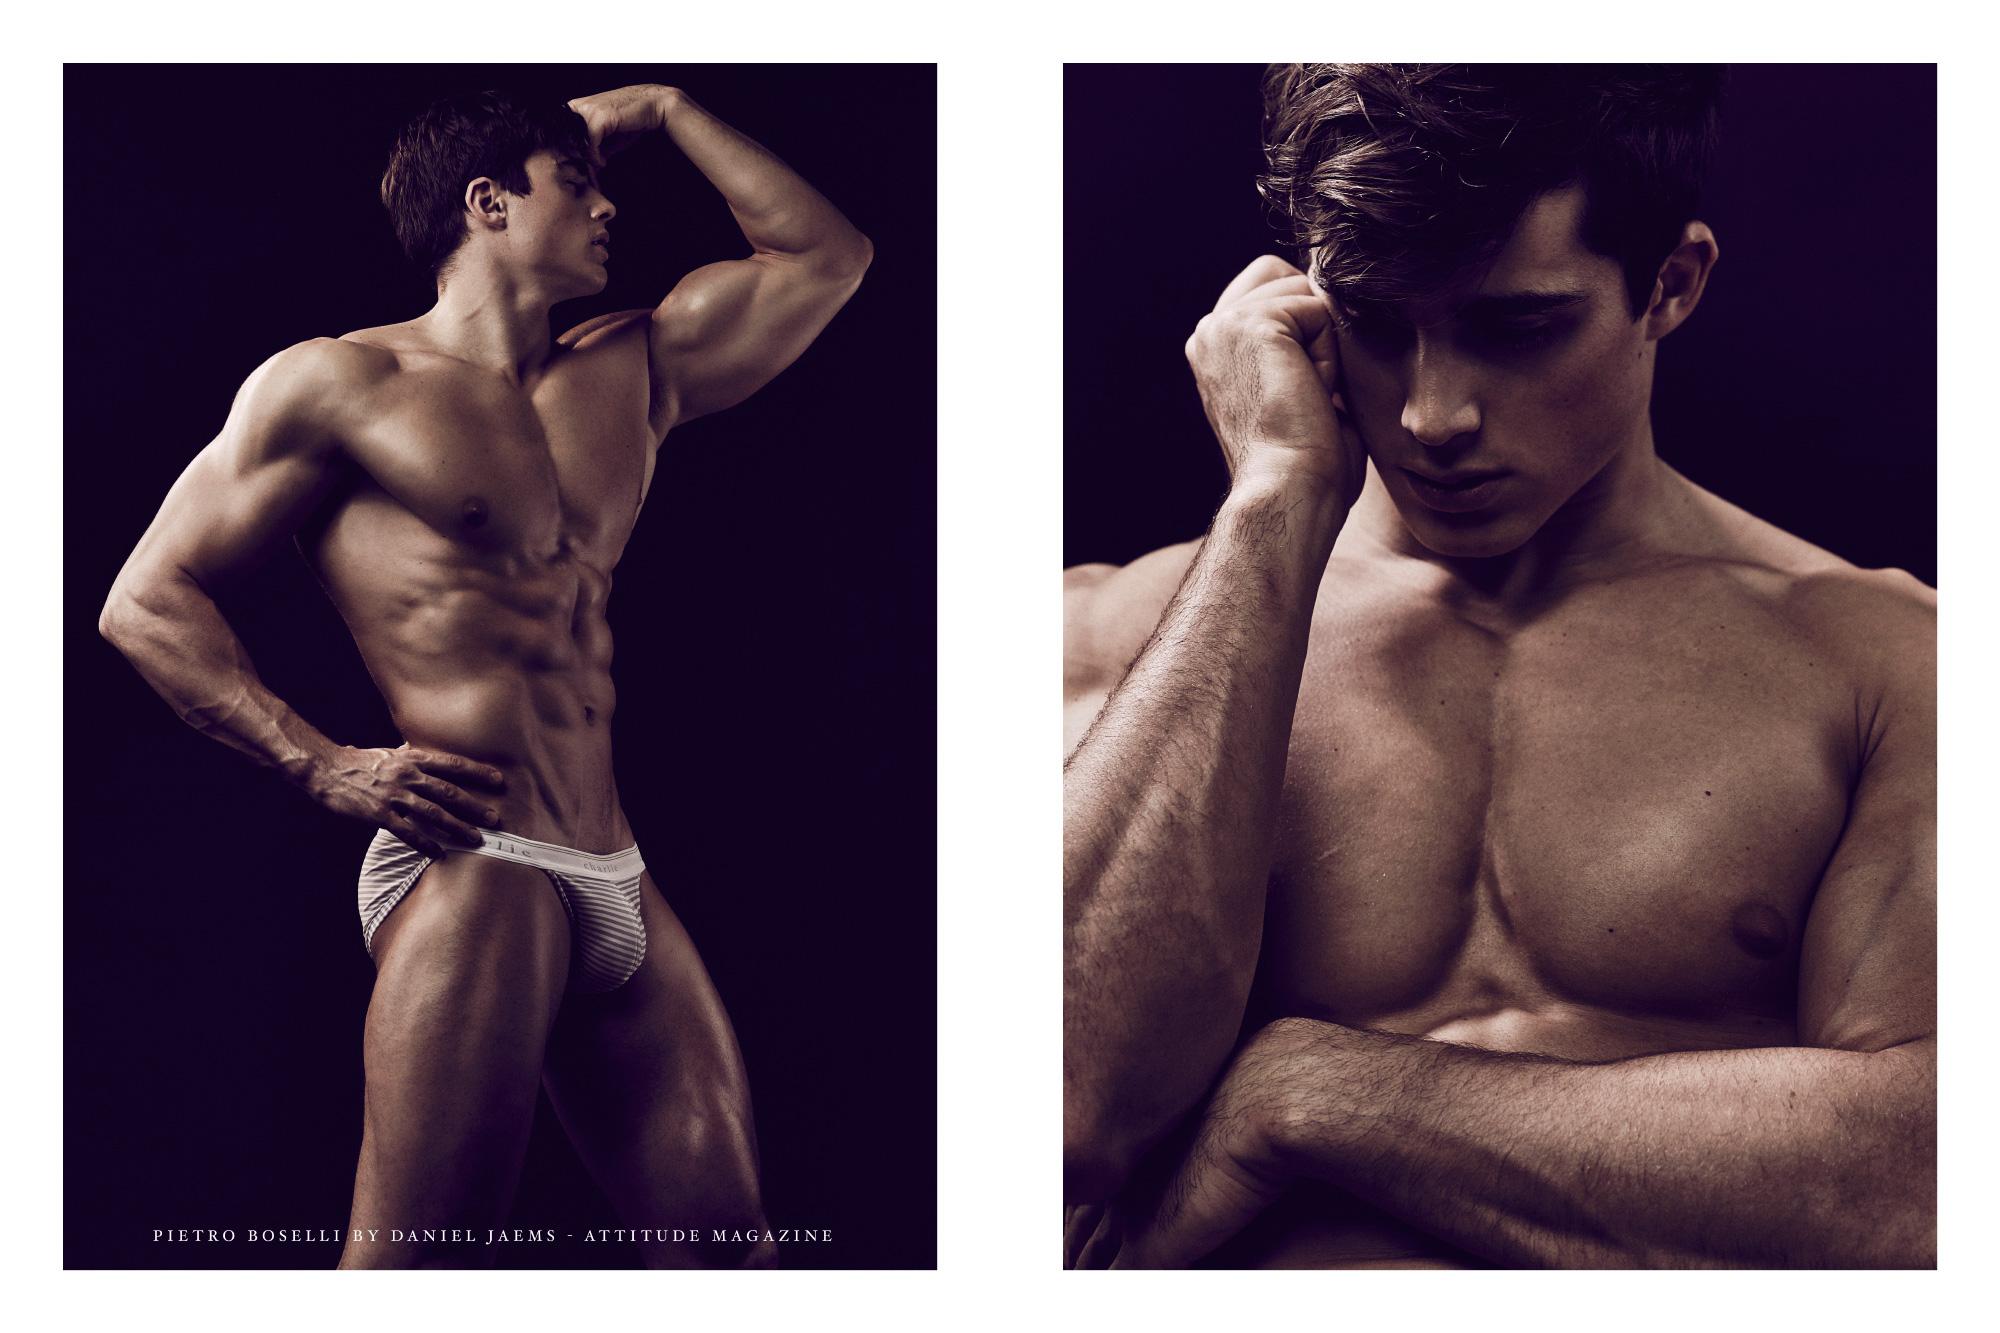 Pietro-Boselli-by-Daniel-Jaems-for-Attitude-Magazine-11